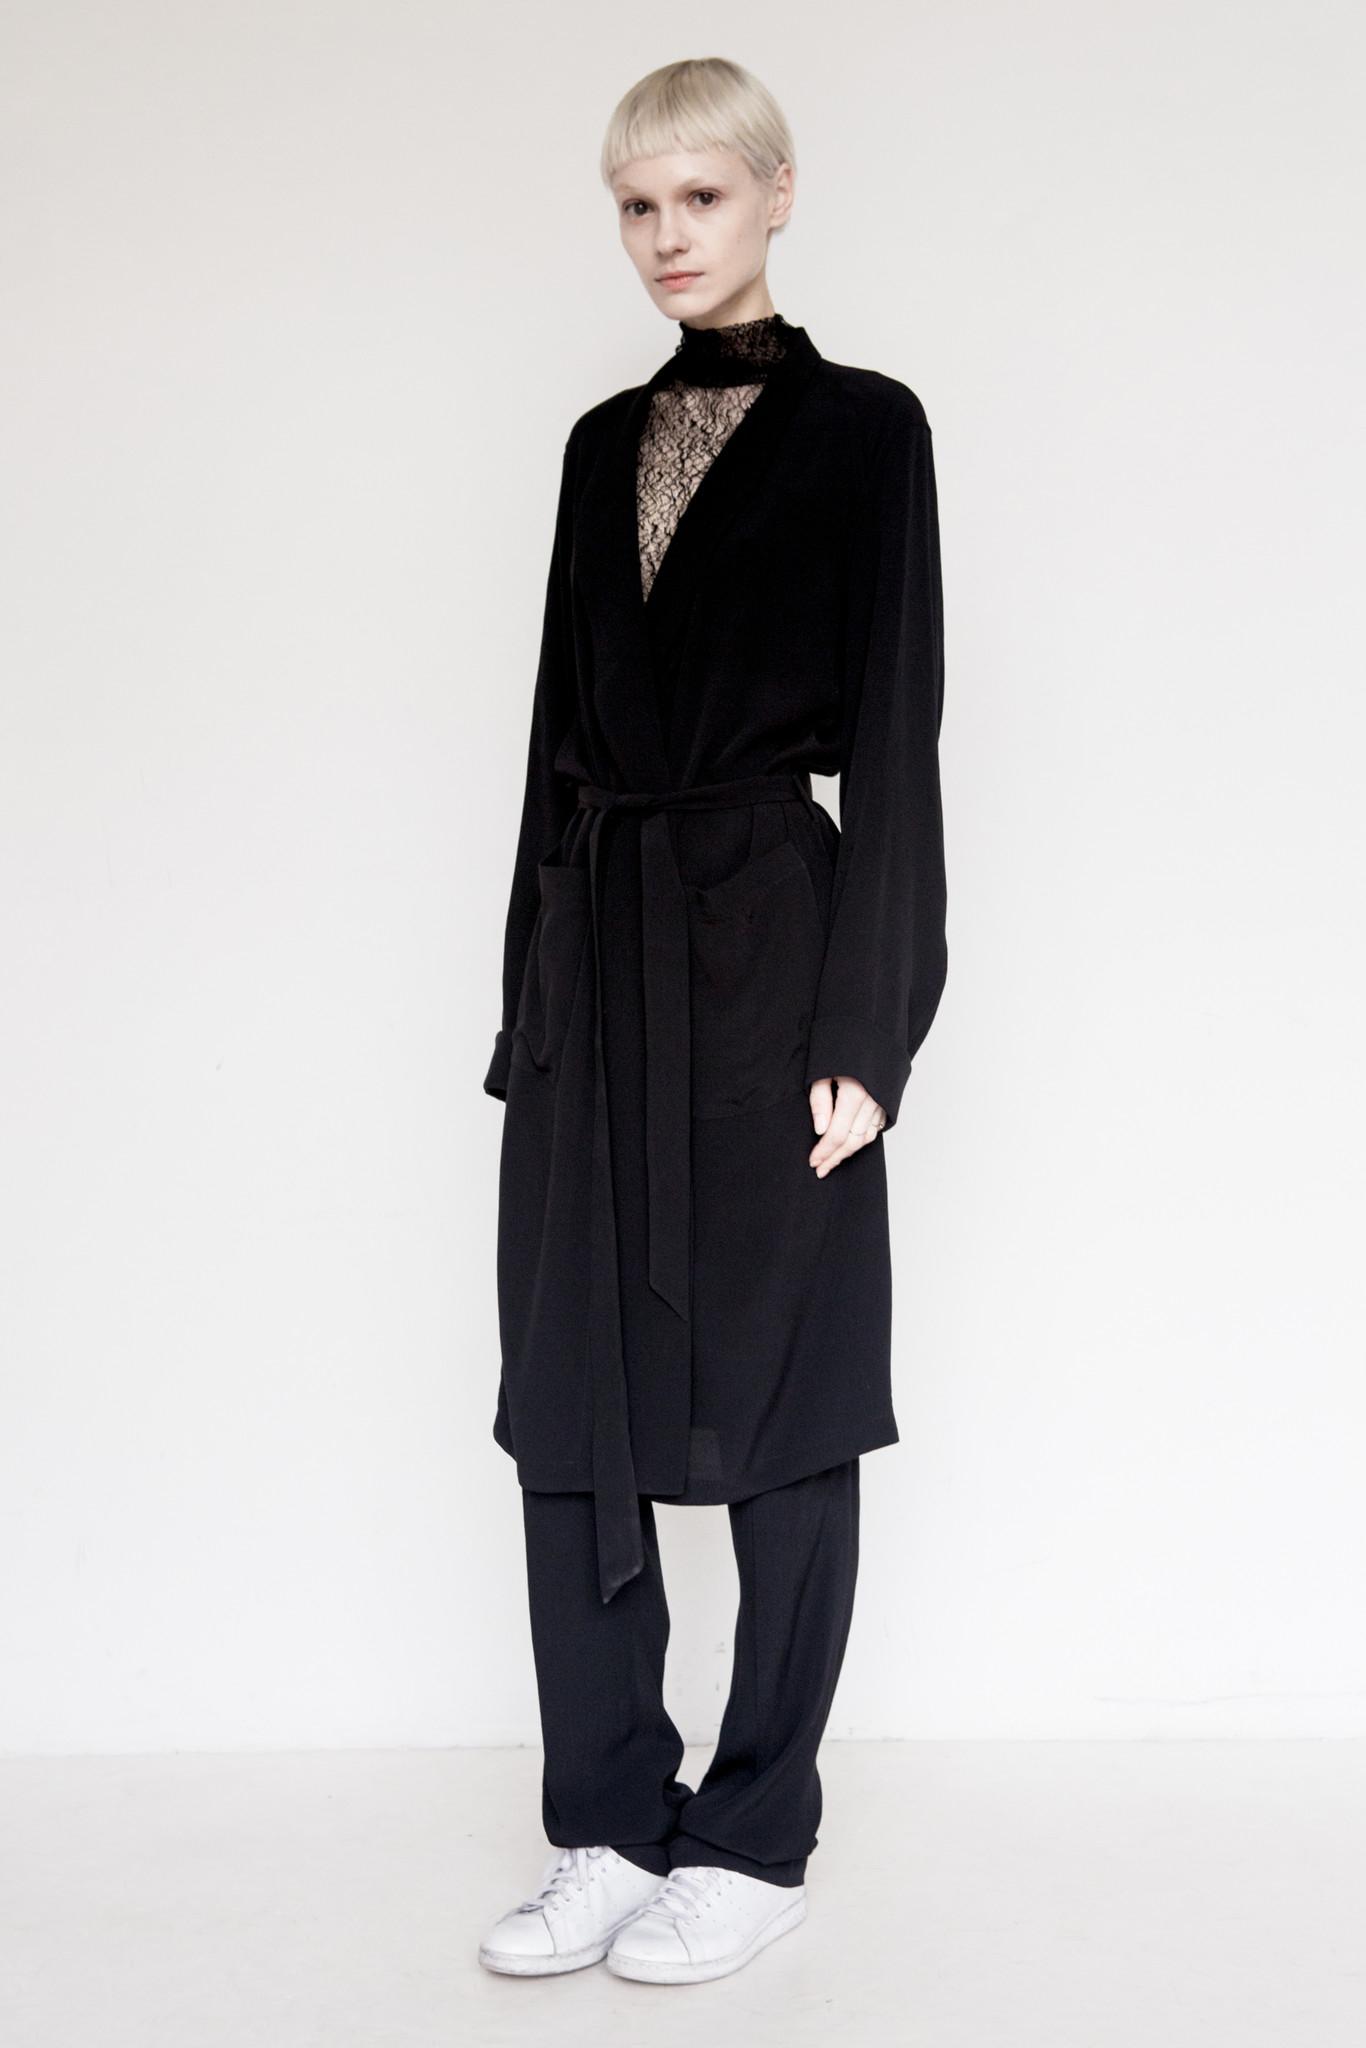 david michael tencel og robe in black lyst With robe tencel